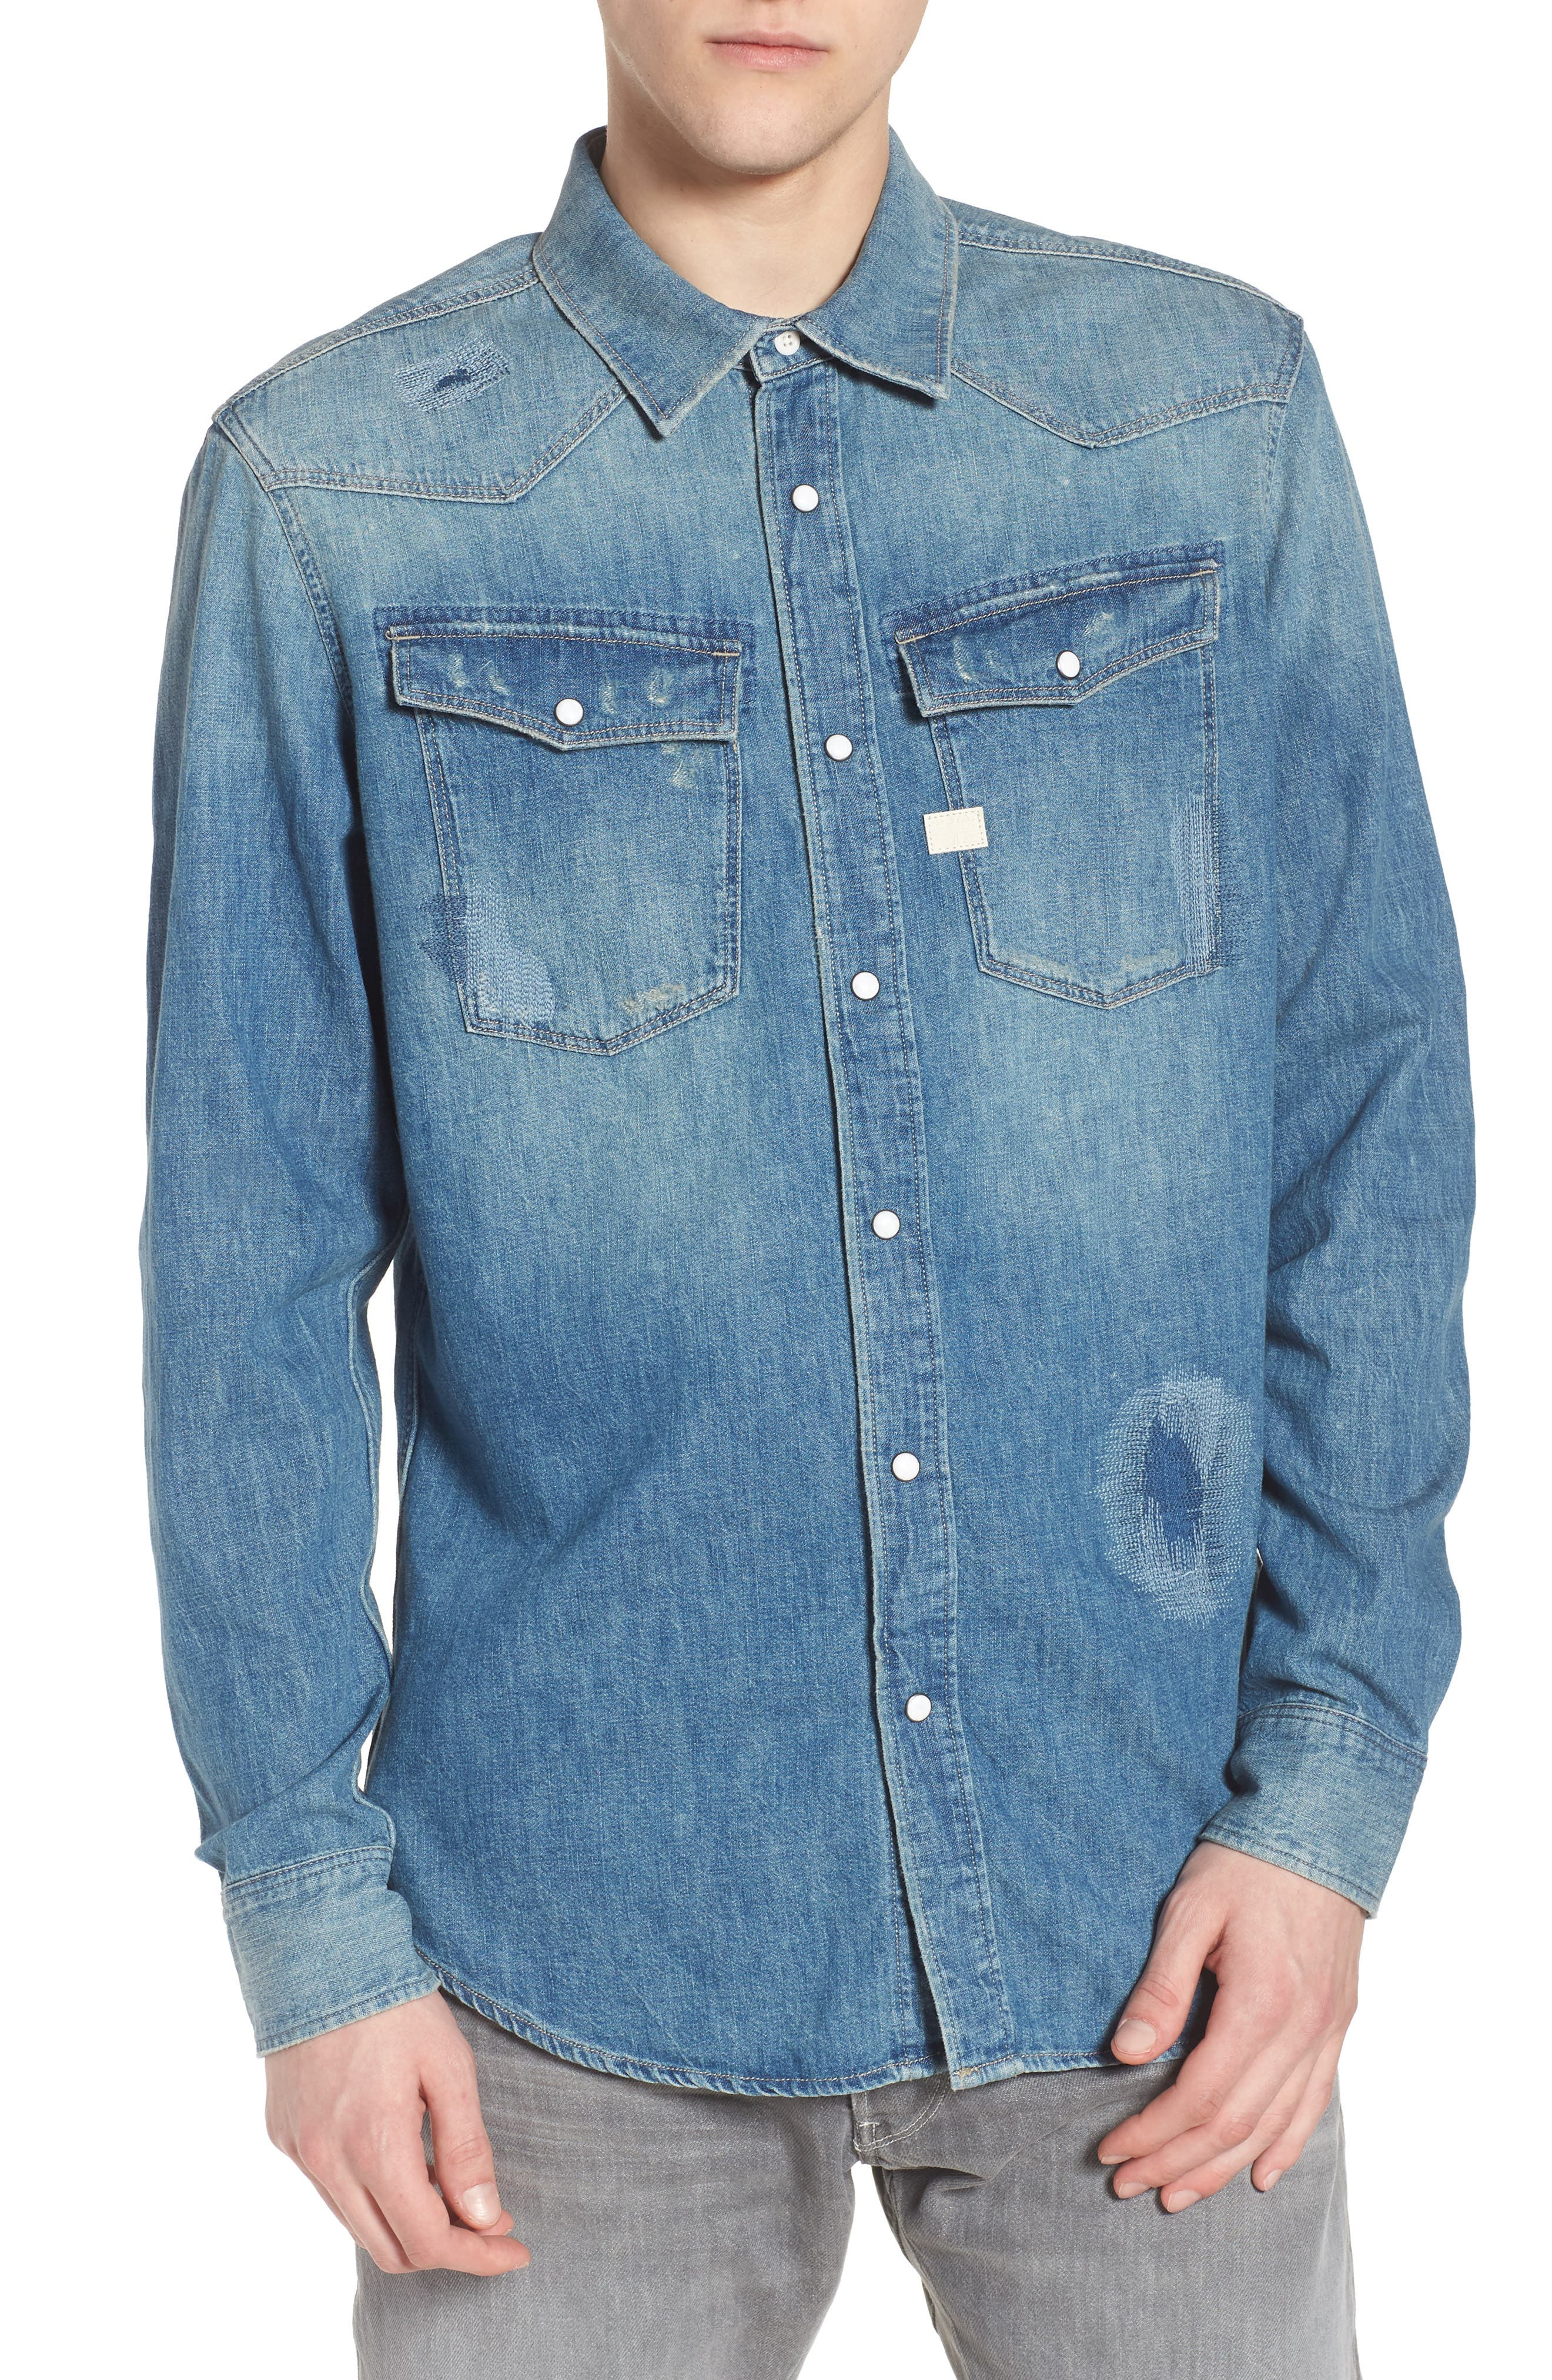 3301 Graft Denim Shirt,                         Main,                         color, 421